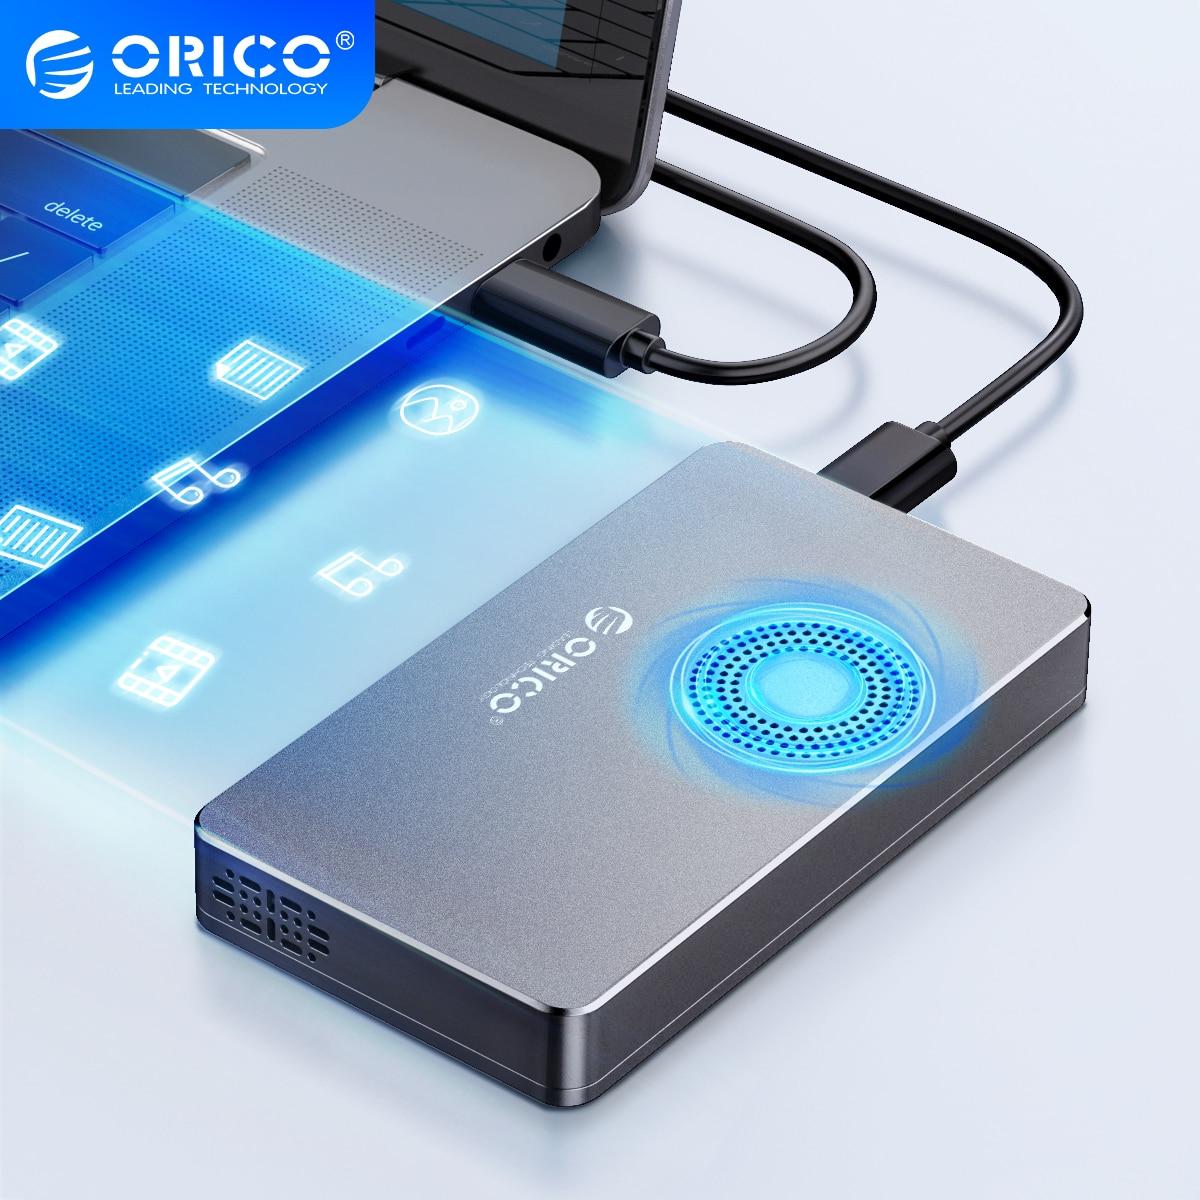 ORICO M2 NVME SSD Case with Fan M.2 to USB3.1 Gen2  for M.2 M Key M+B Key SSD Disk USB C 10Gbps Hard Drive Enclosure M.2 SSD Box